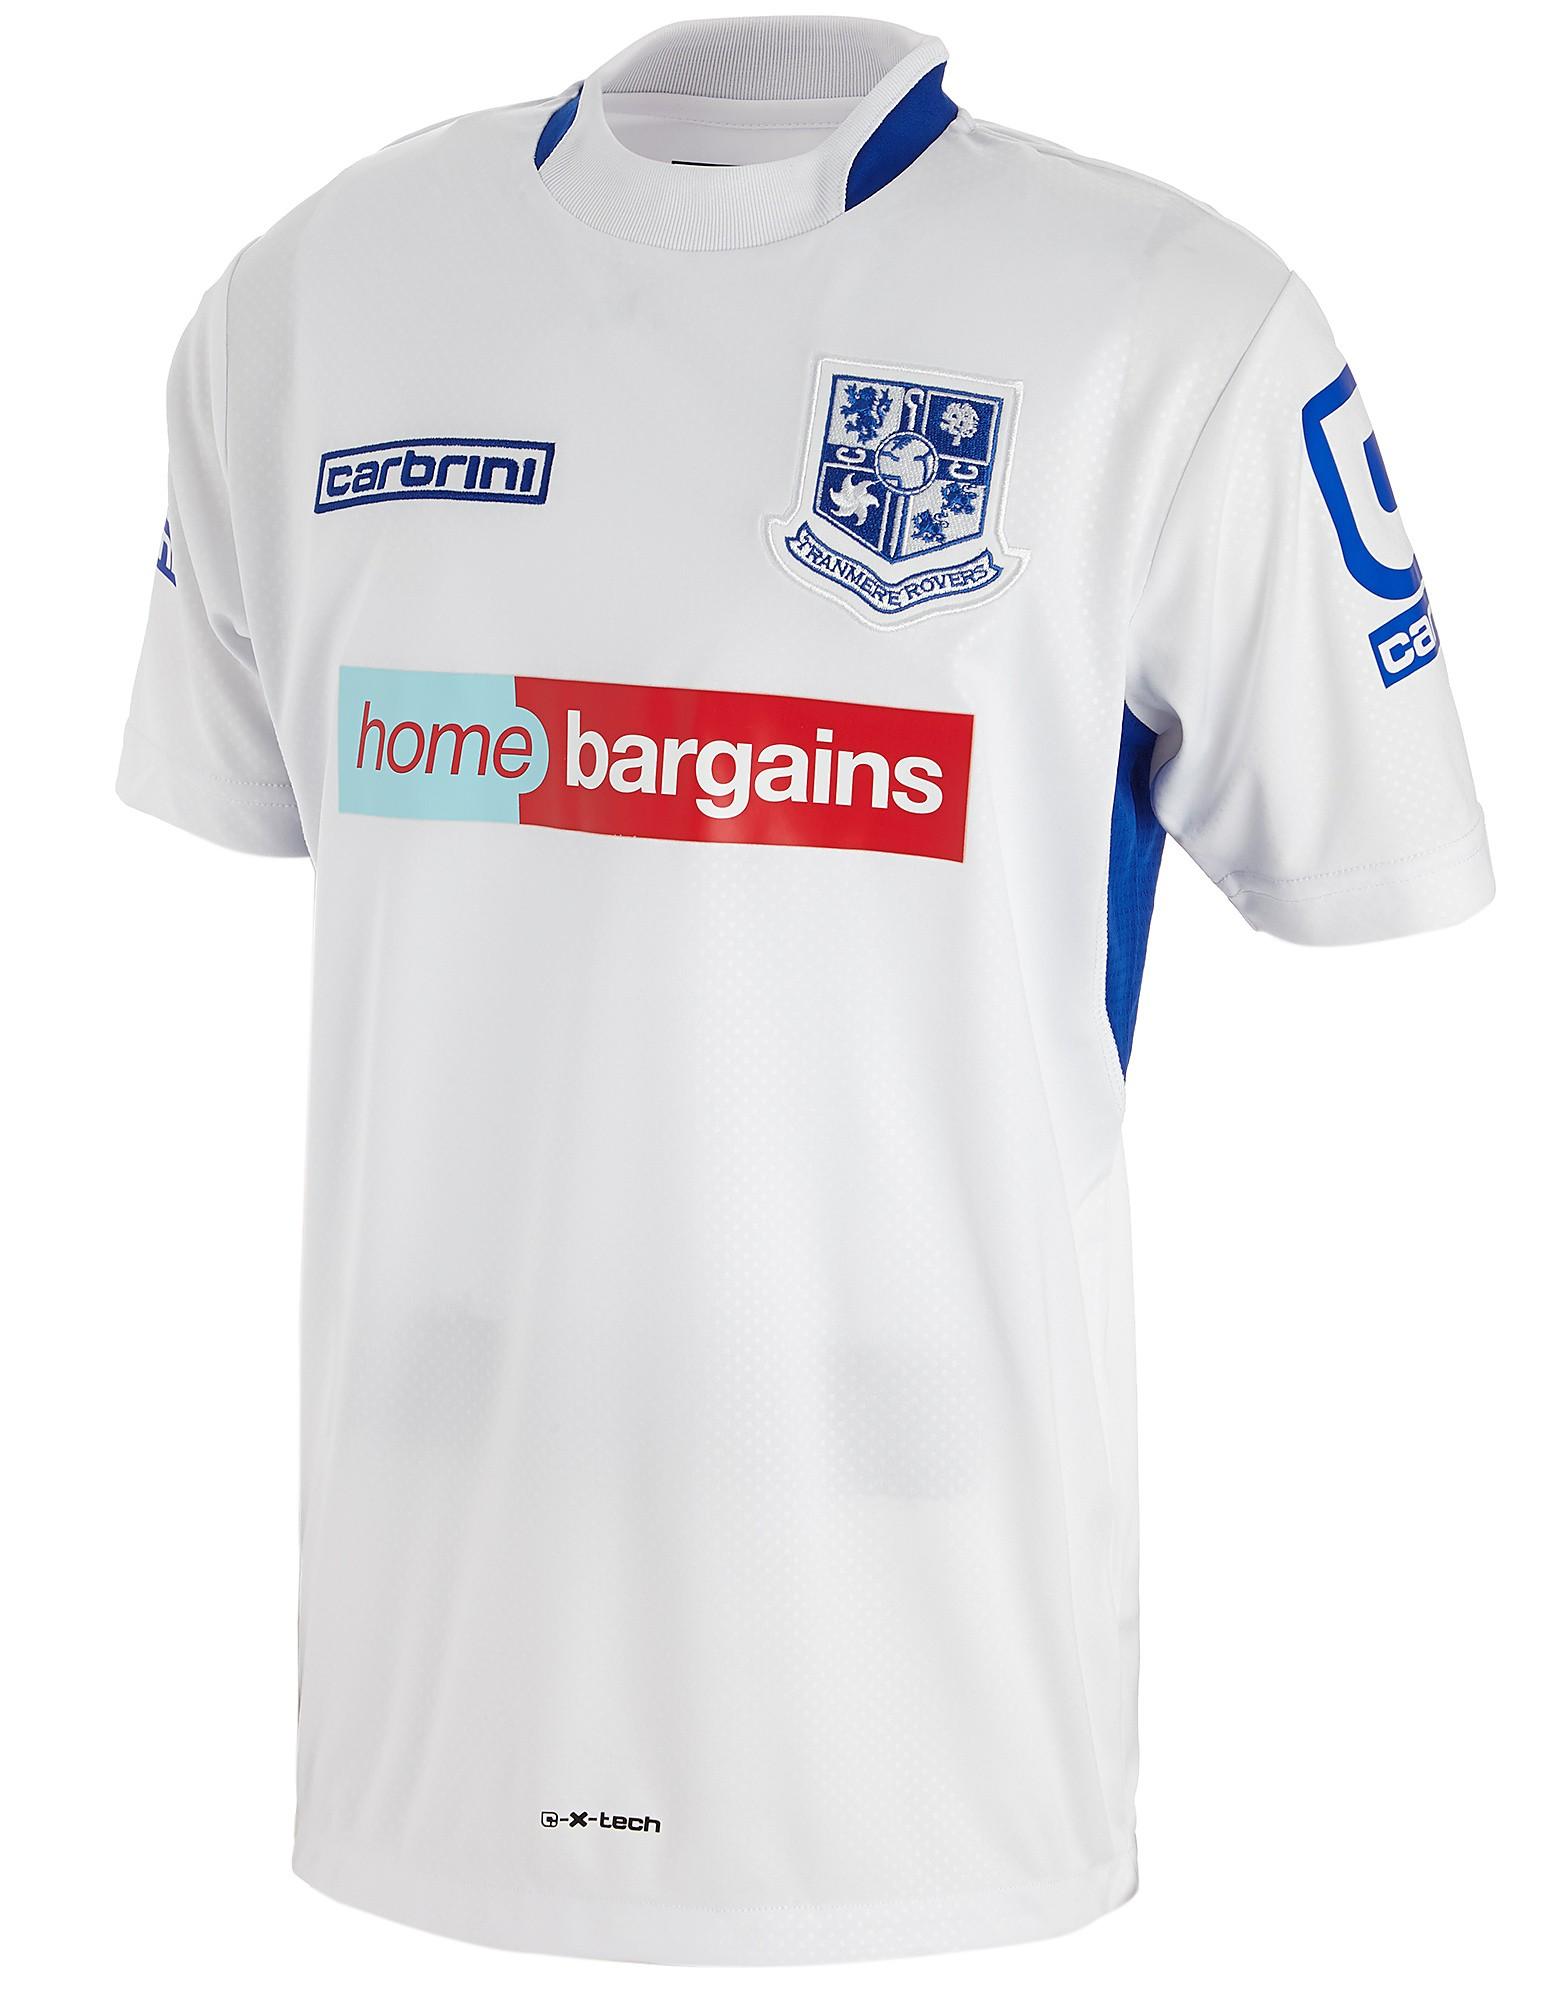 Blackpool FC Former Players Association - Posts | Facebook